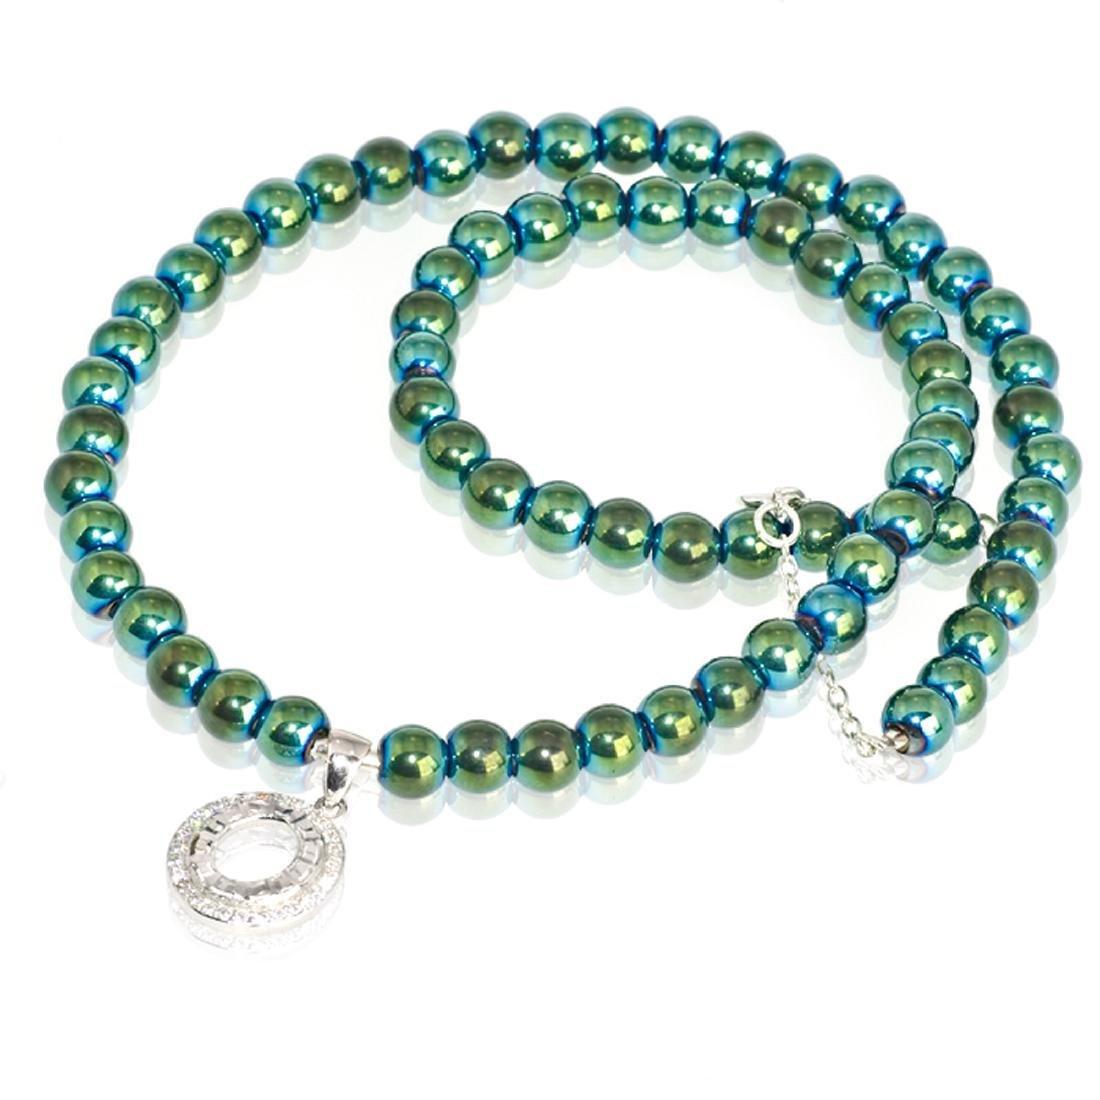 Sterling Silver Green Mirror Hematite Zirconia Necklace - 4